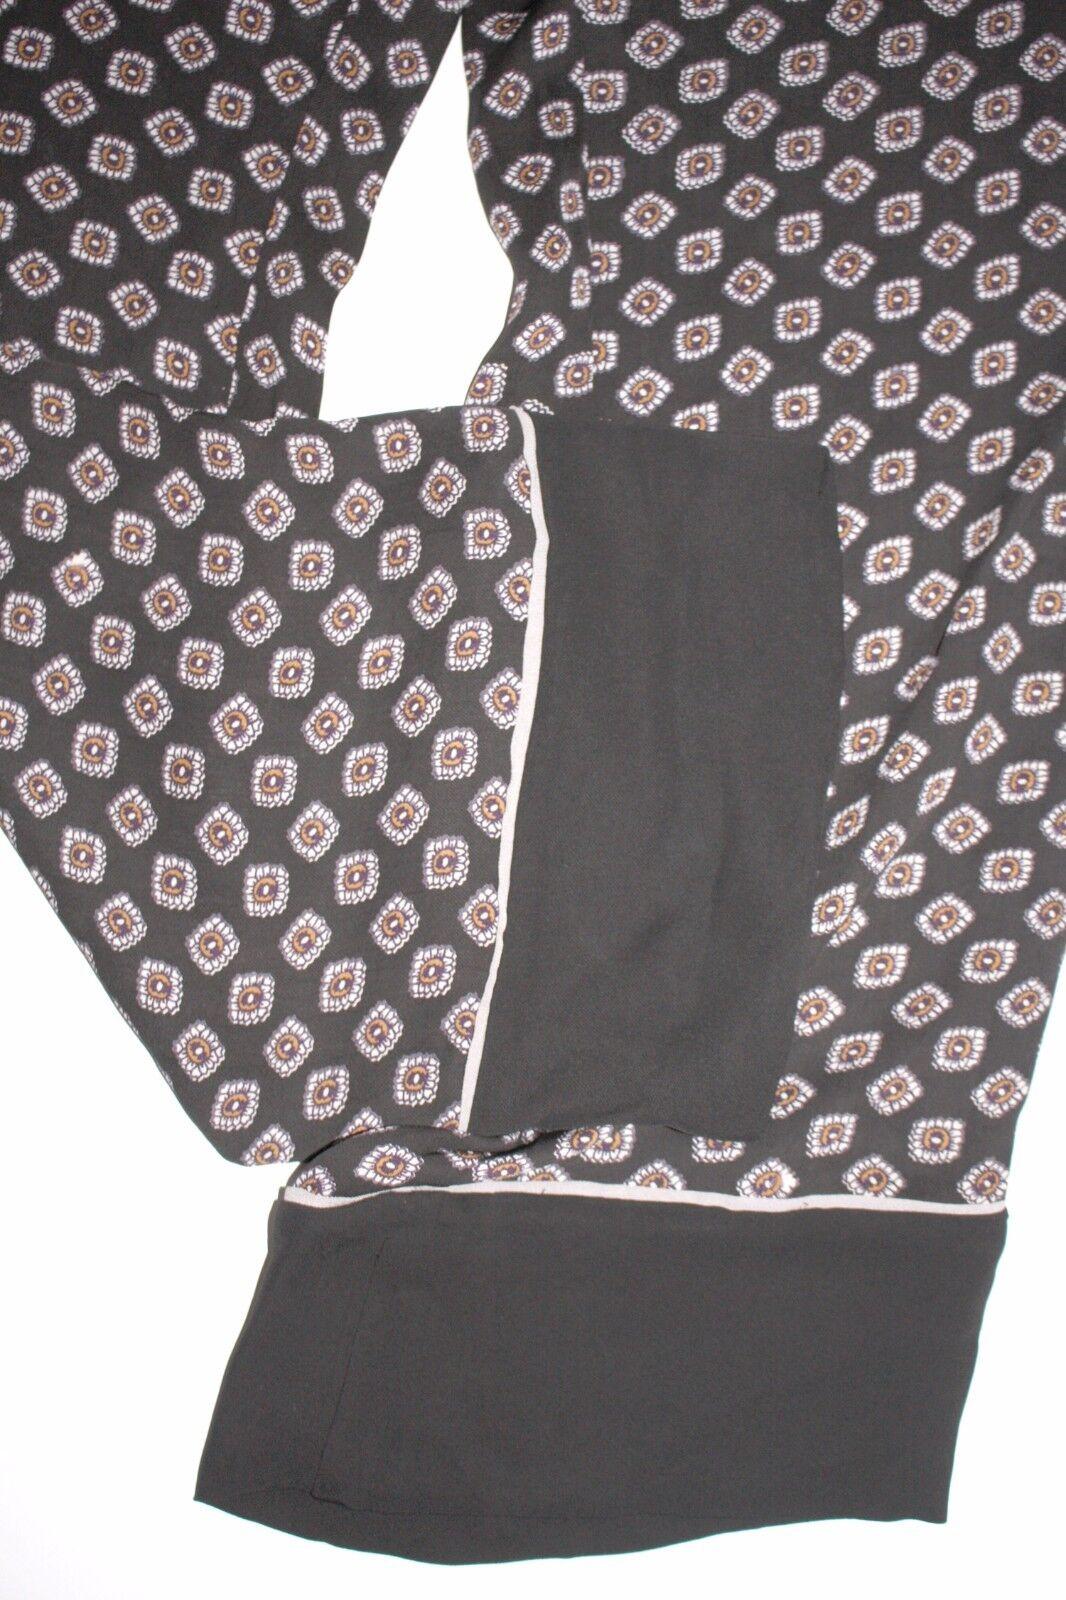 Noa noa Pants pantalones Double Double Double VISCOSE Print gris Talla  42 nuevo a866db